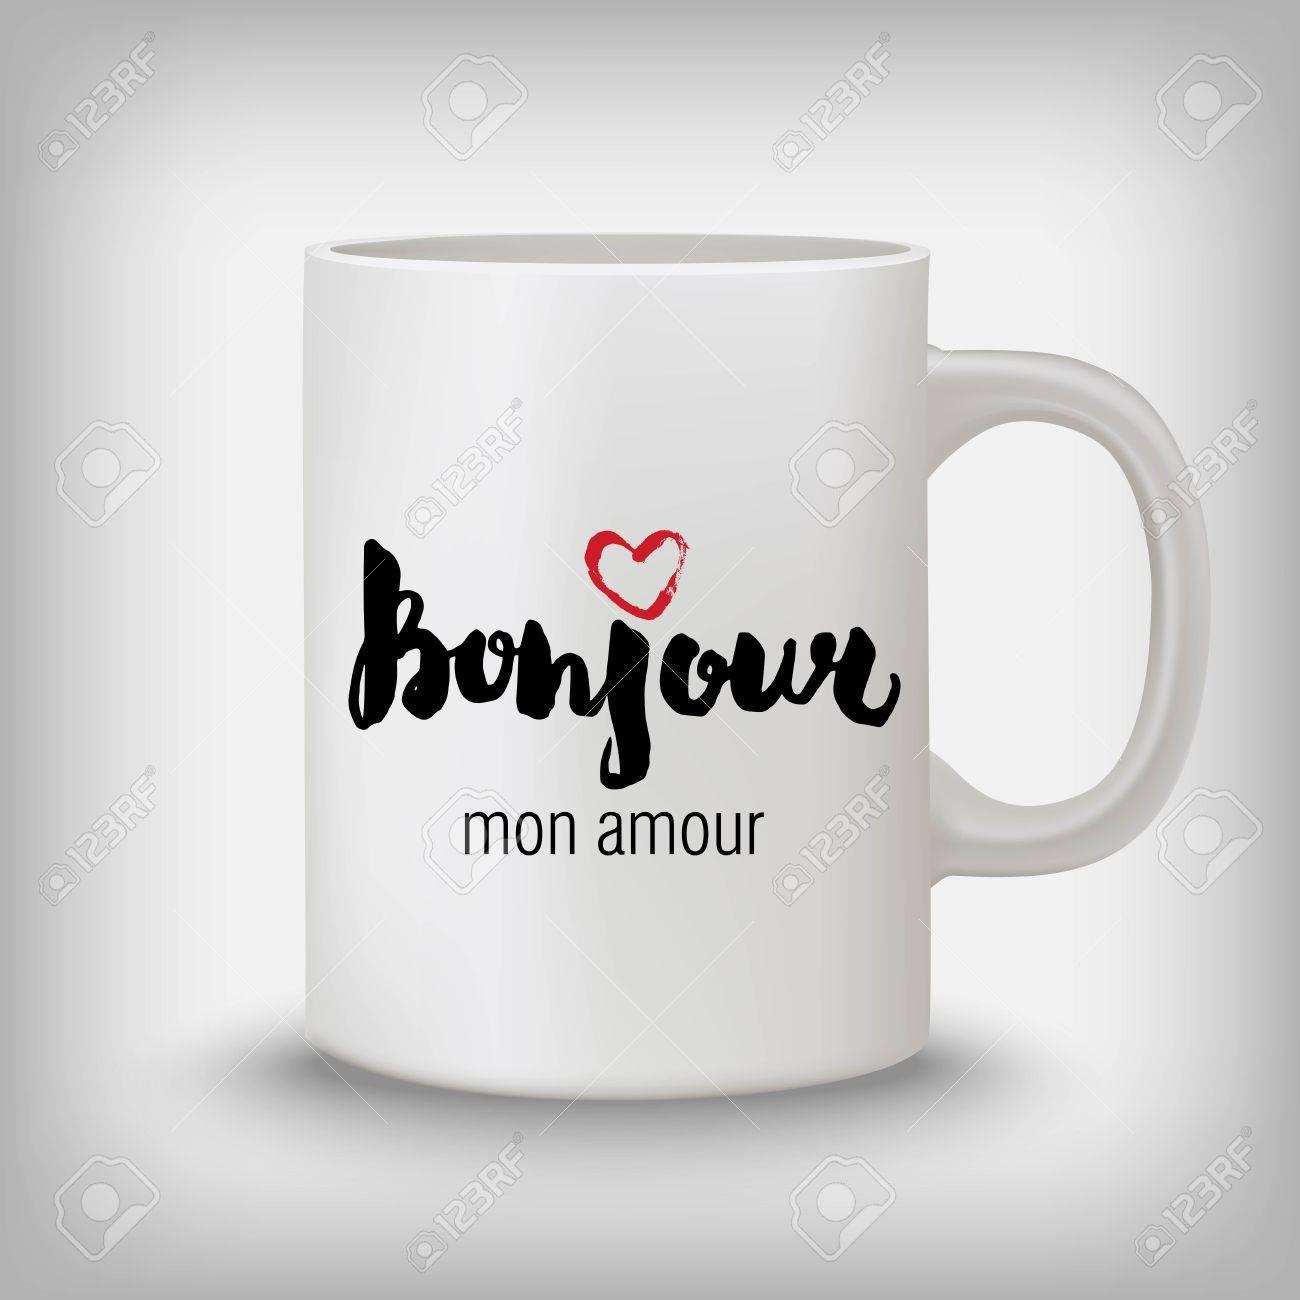 Bonjour Mon Amour Hello My Love French Stylish Hand Drawn Design